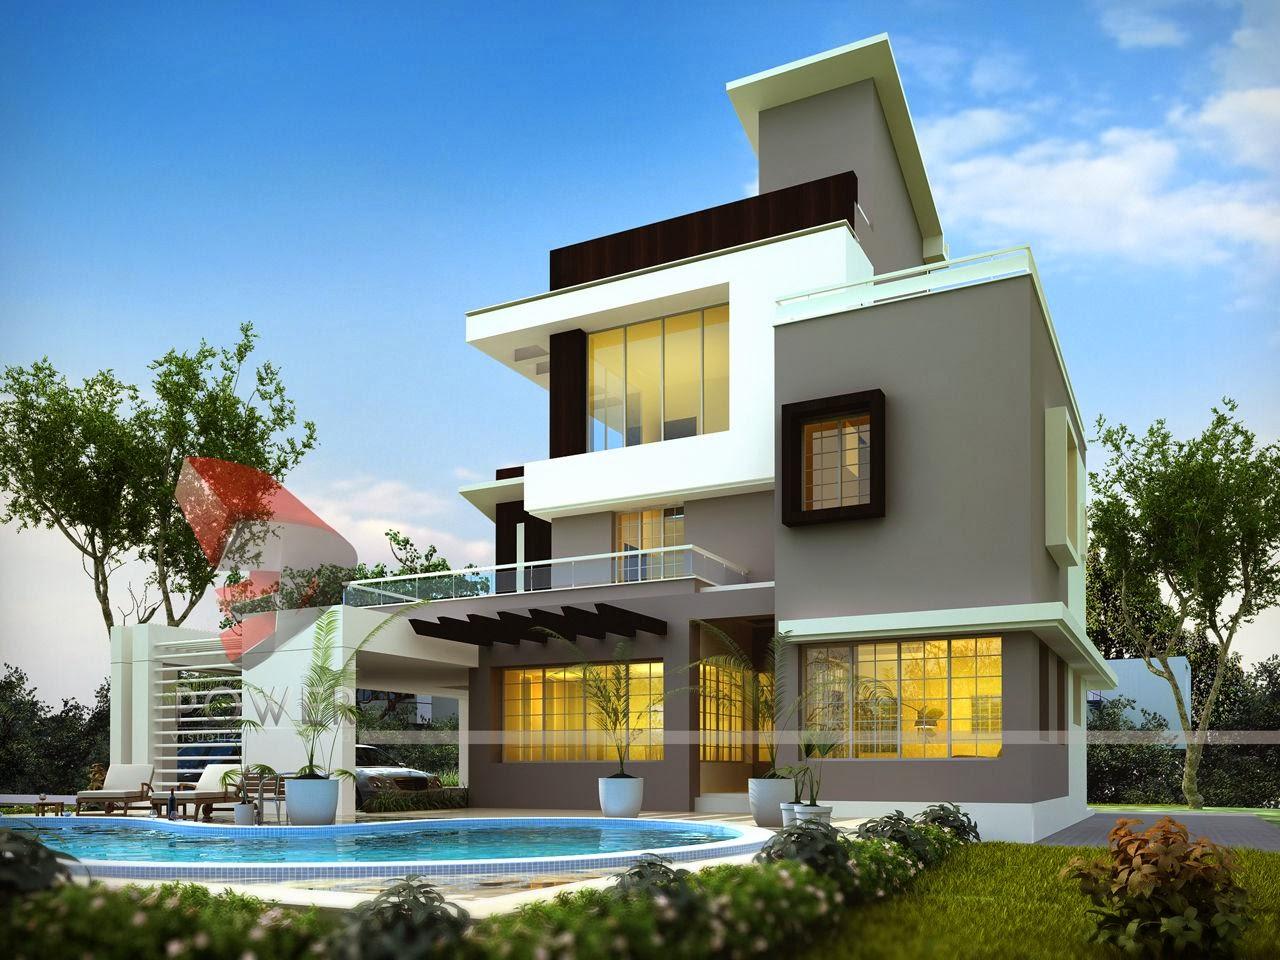 House 3D Interior Exterior Design Rendering   Modern Home ...